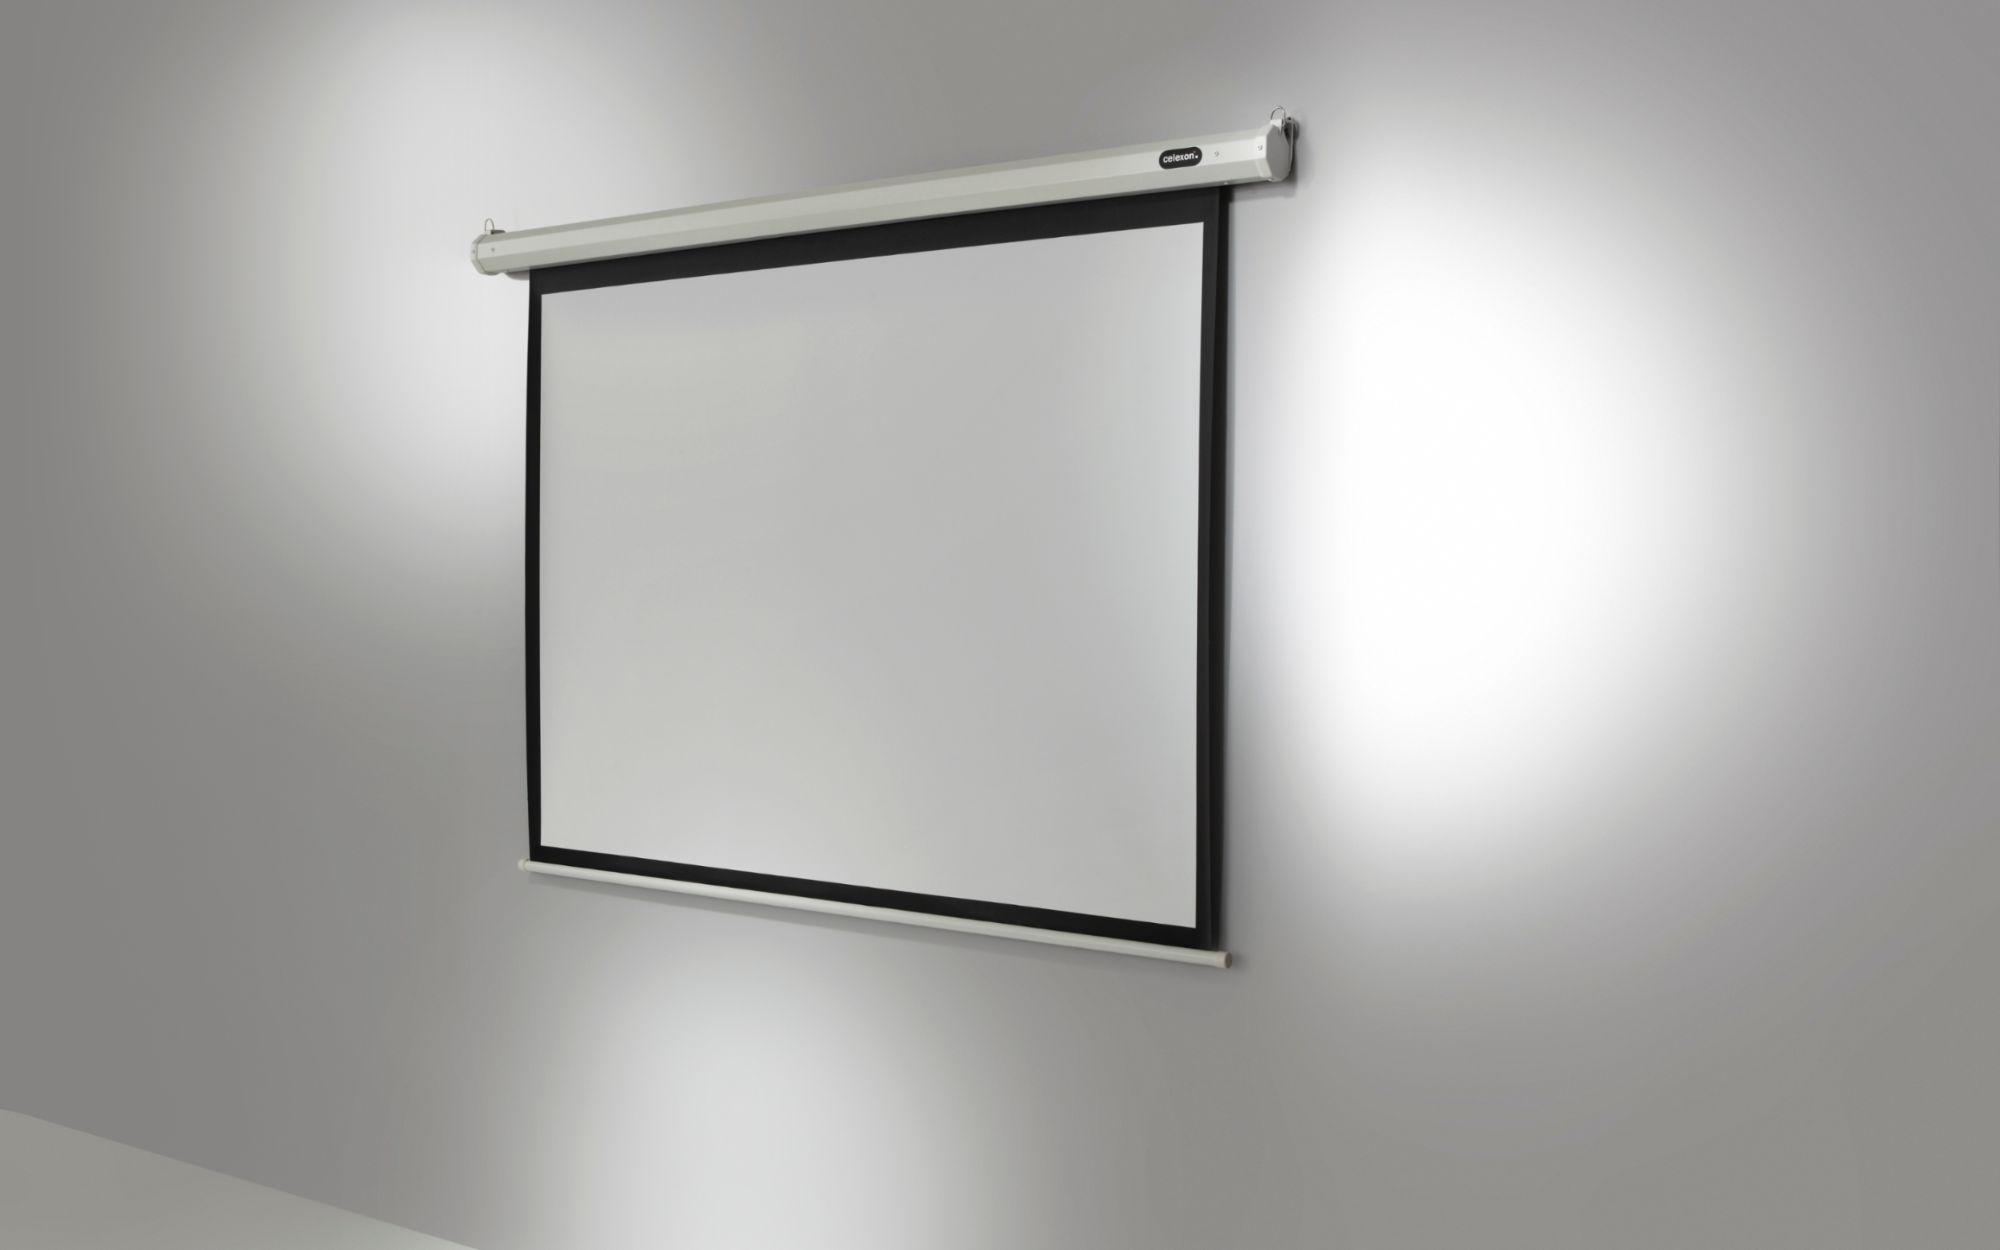 celexon ecran de projection economy motoris 220 x 165 cm. Black Bedroom Furniture Sets. Home Design Ideas